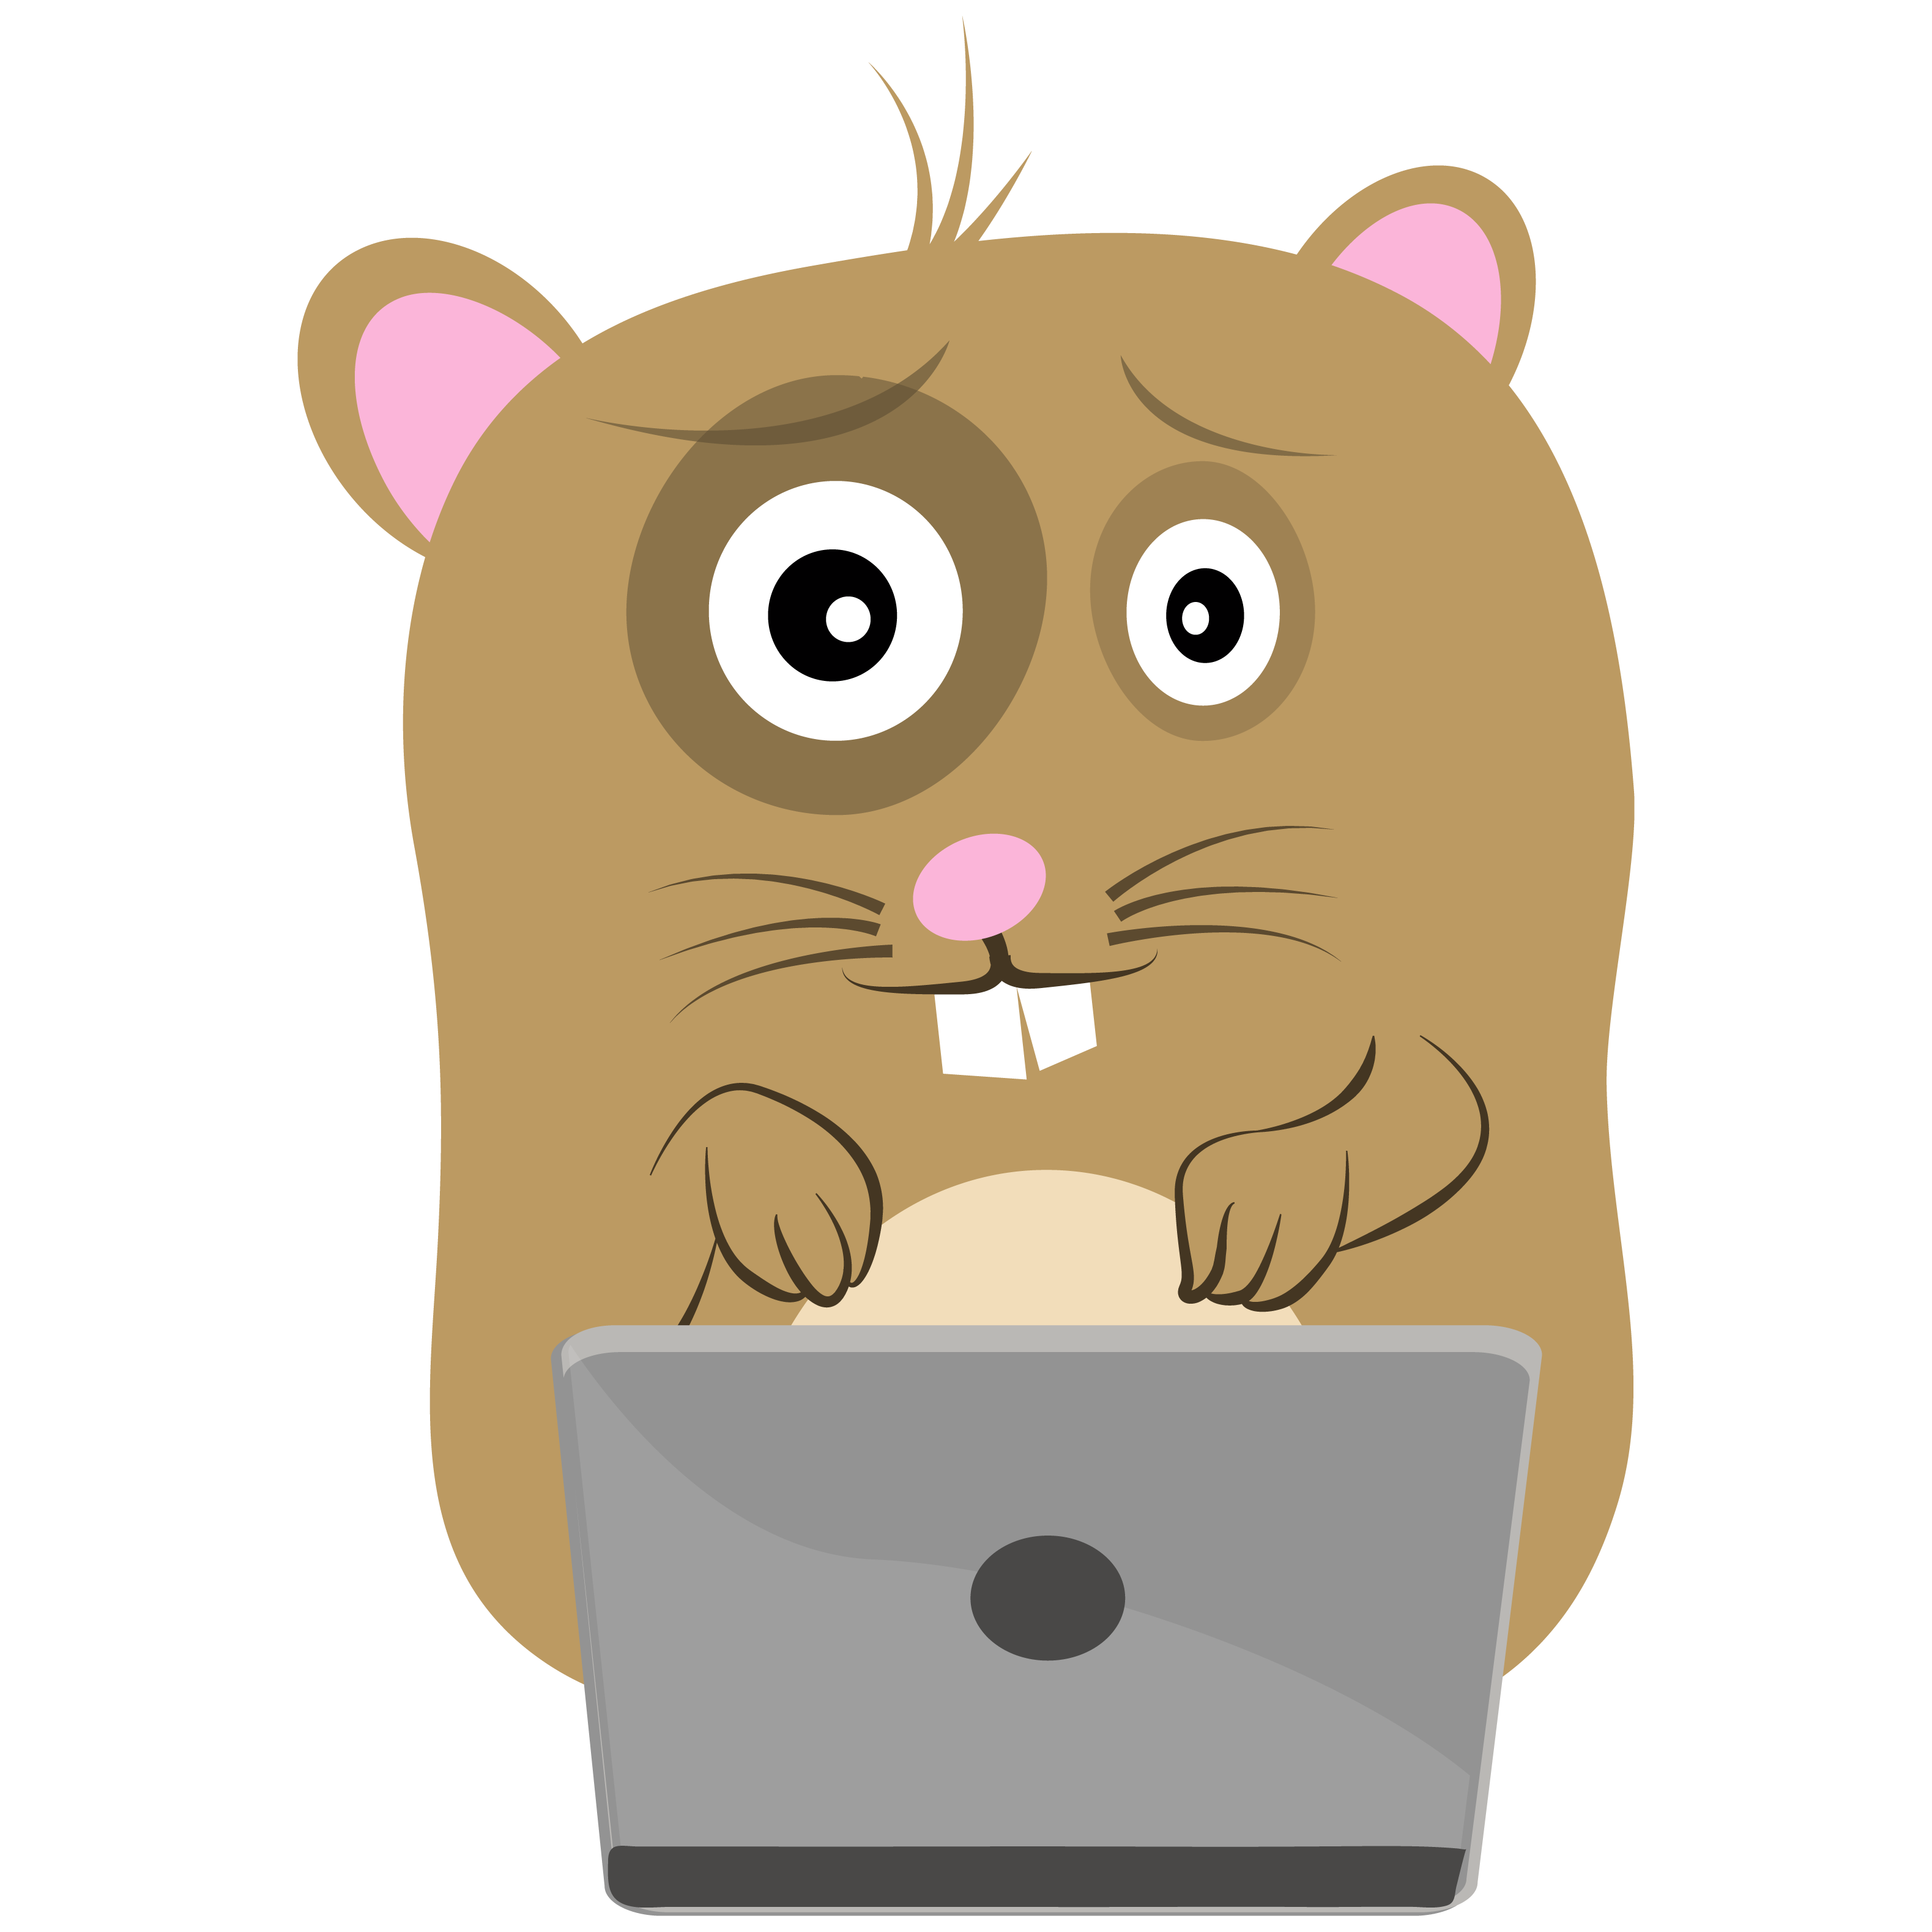 Awkward awkwardhamster twitter. Hamster clipart gerbil